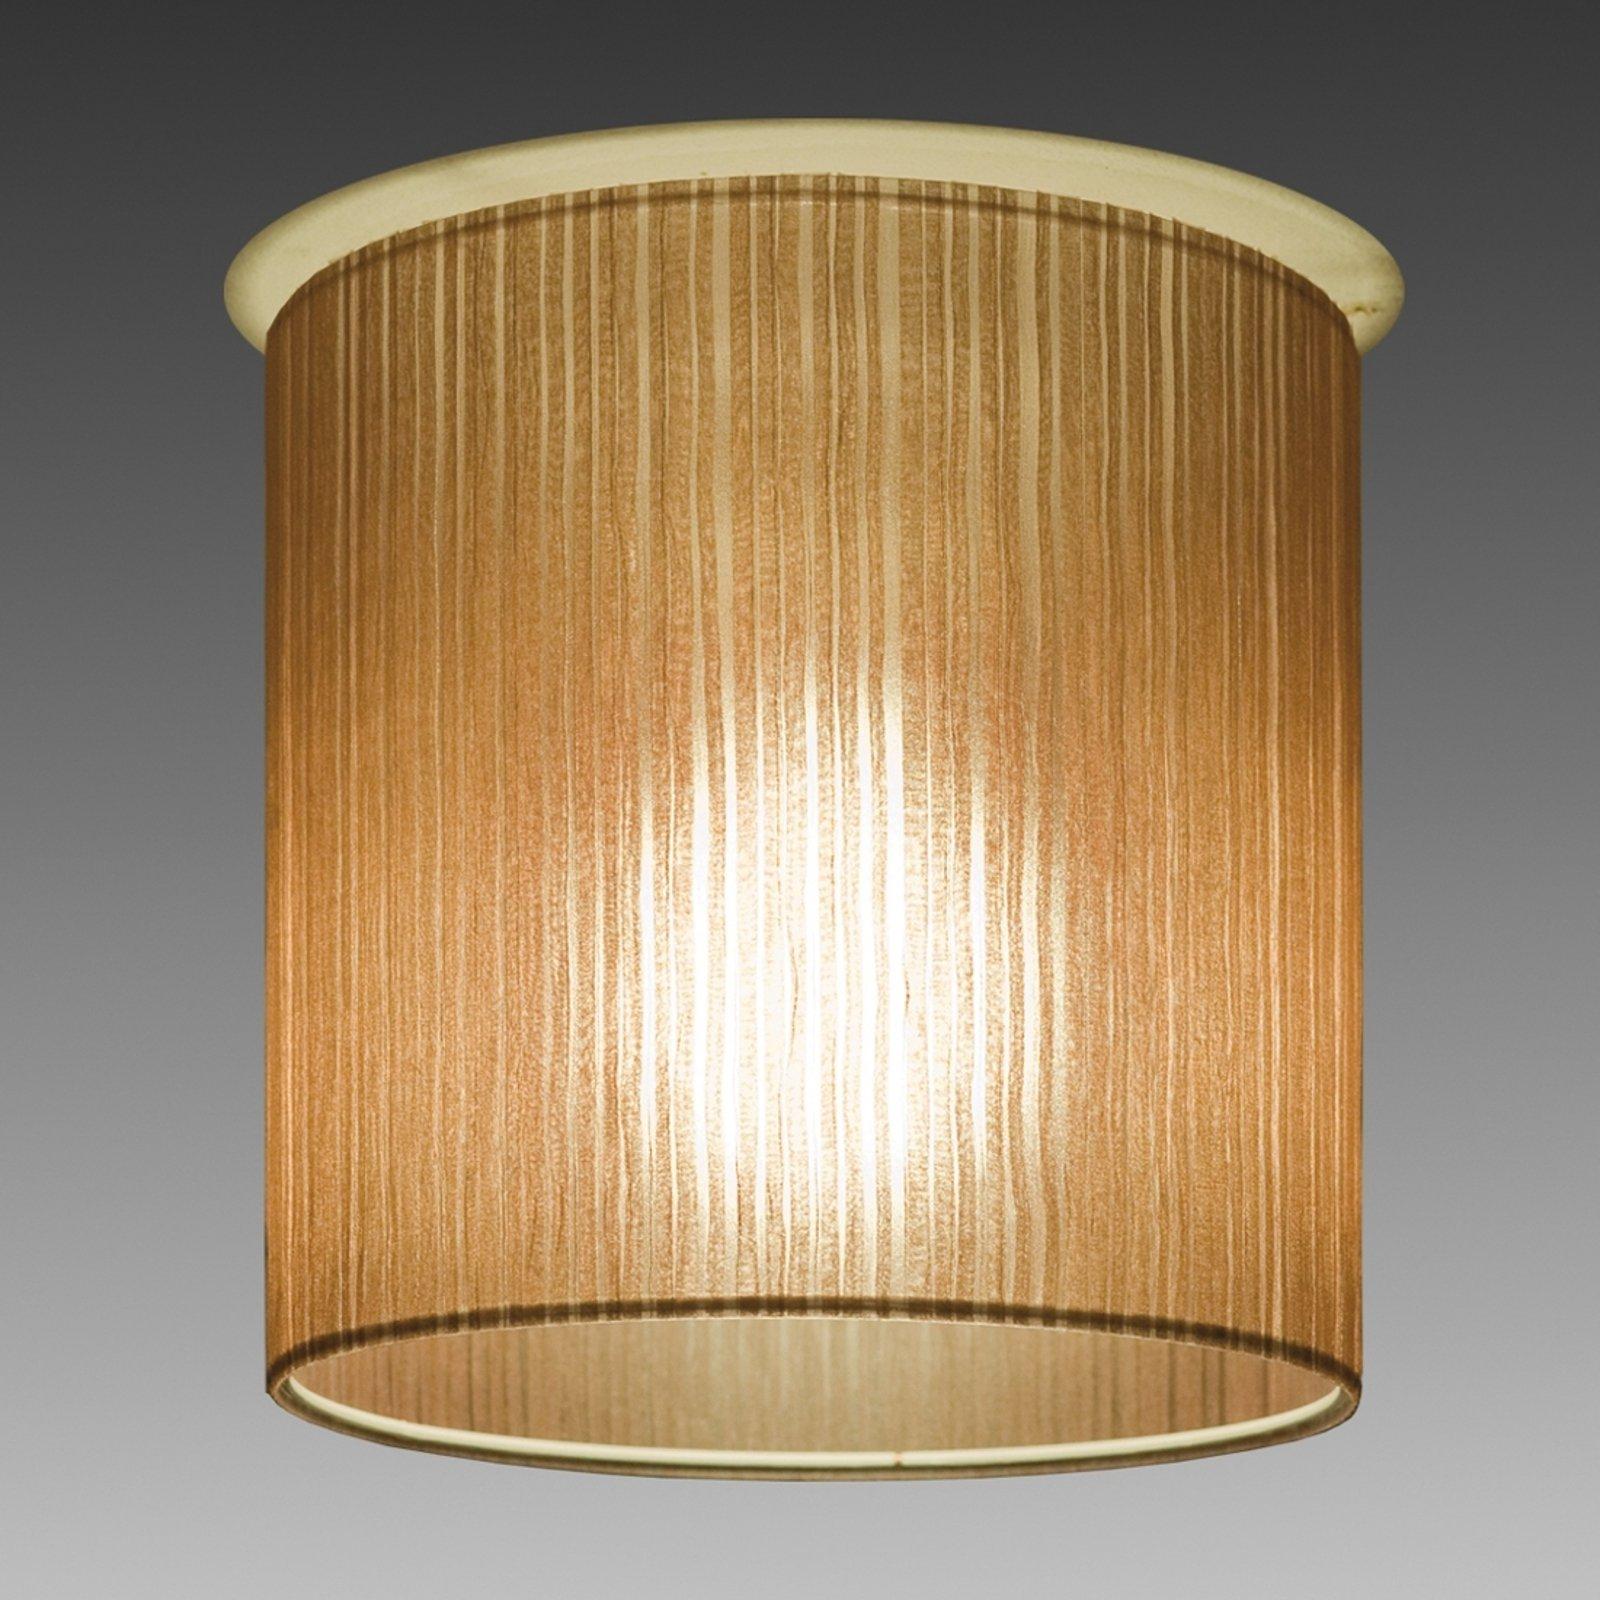 Brun Ganzo taklampe Ø 20 cm